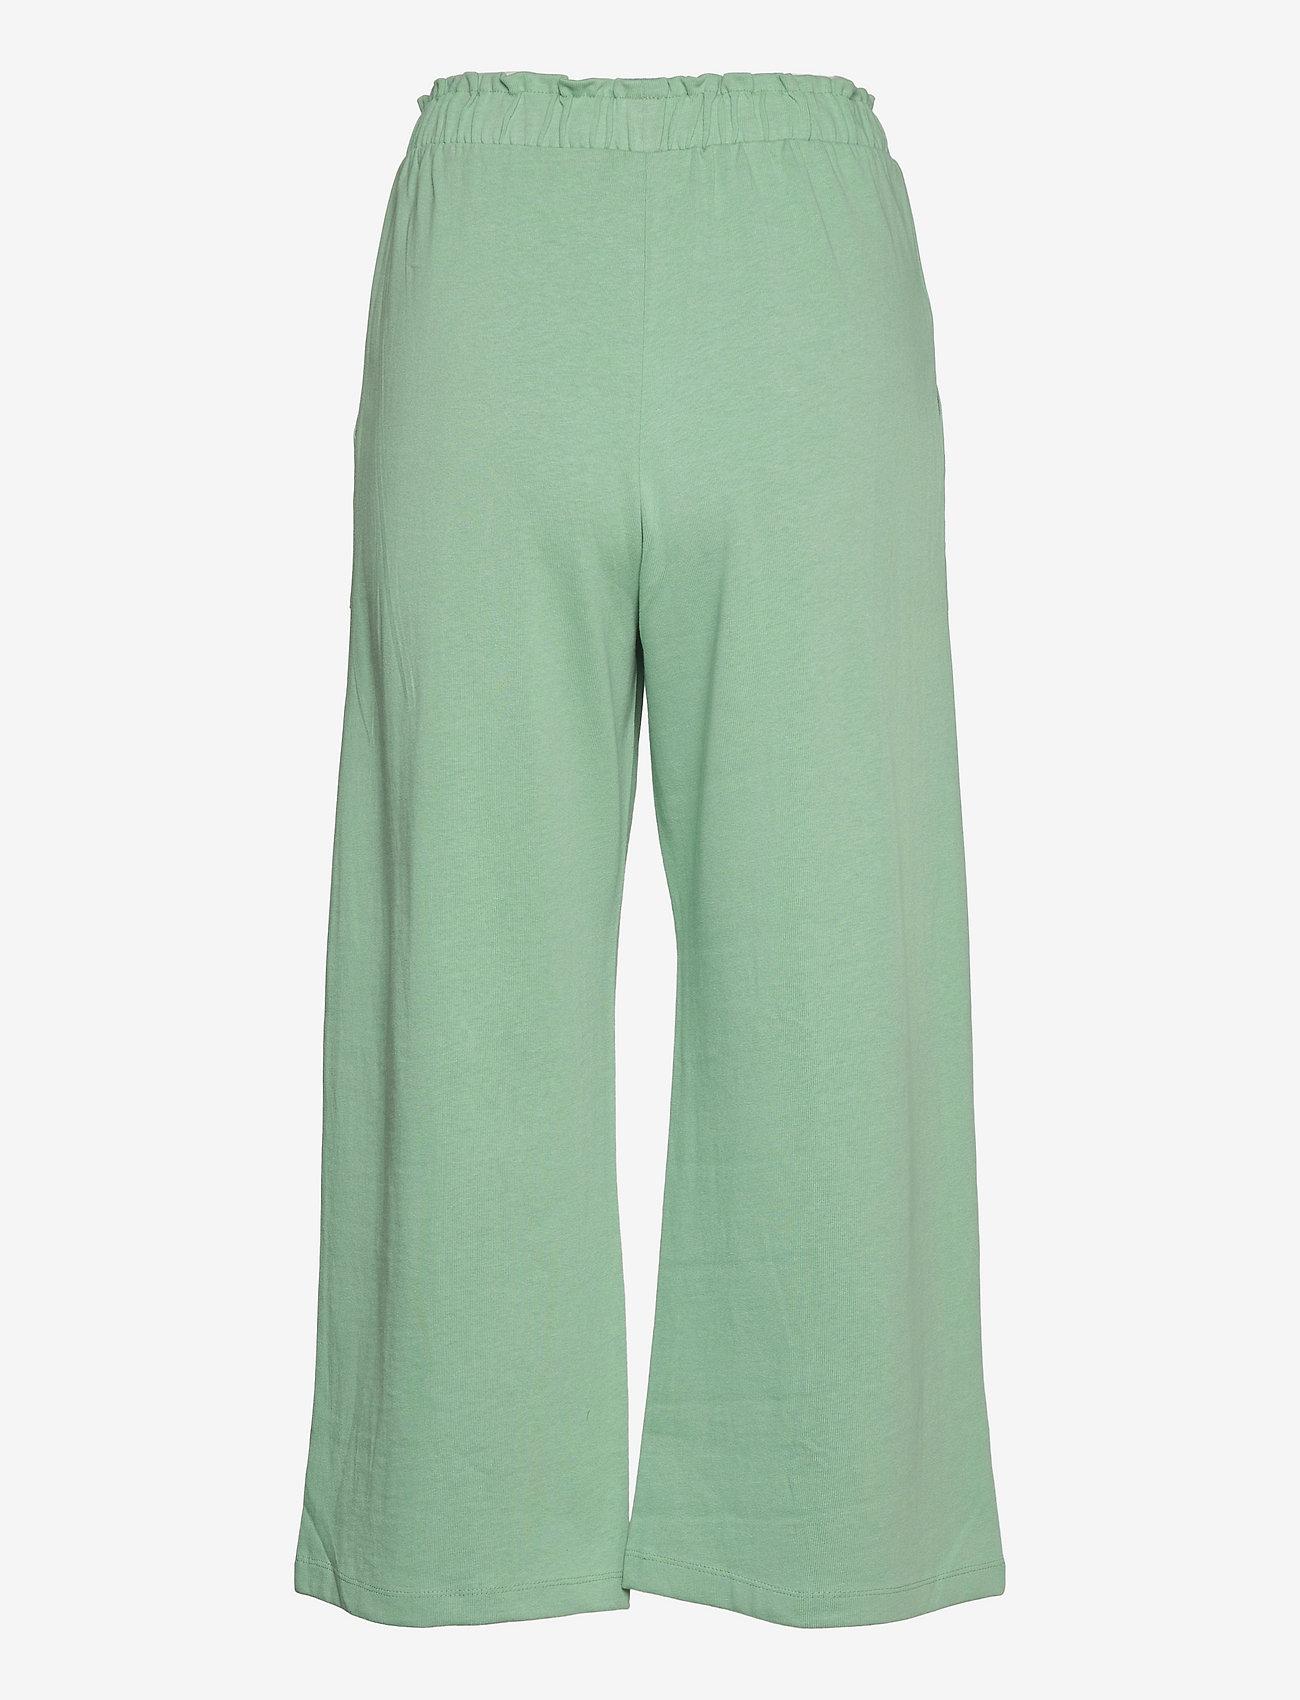 Mango - CLAY - bukser med brede ben - pastel green - 1